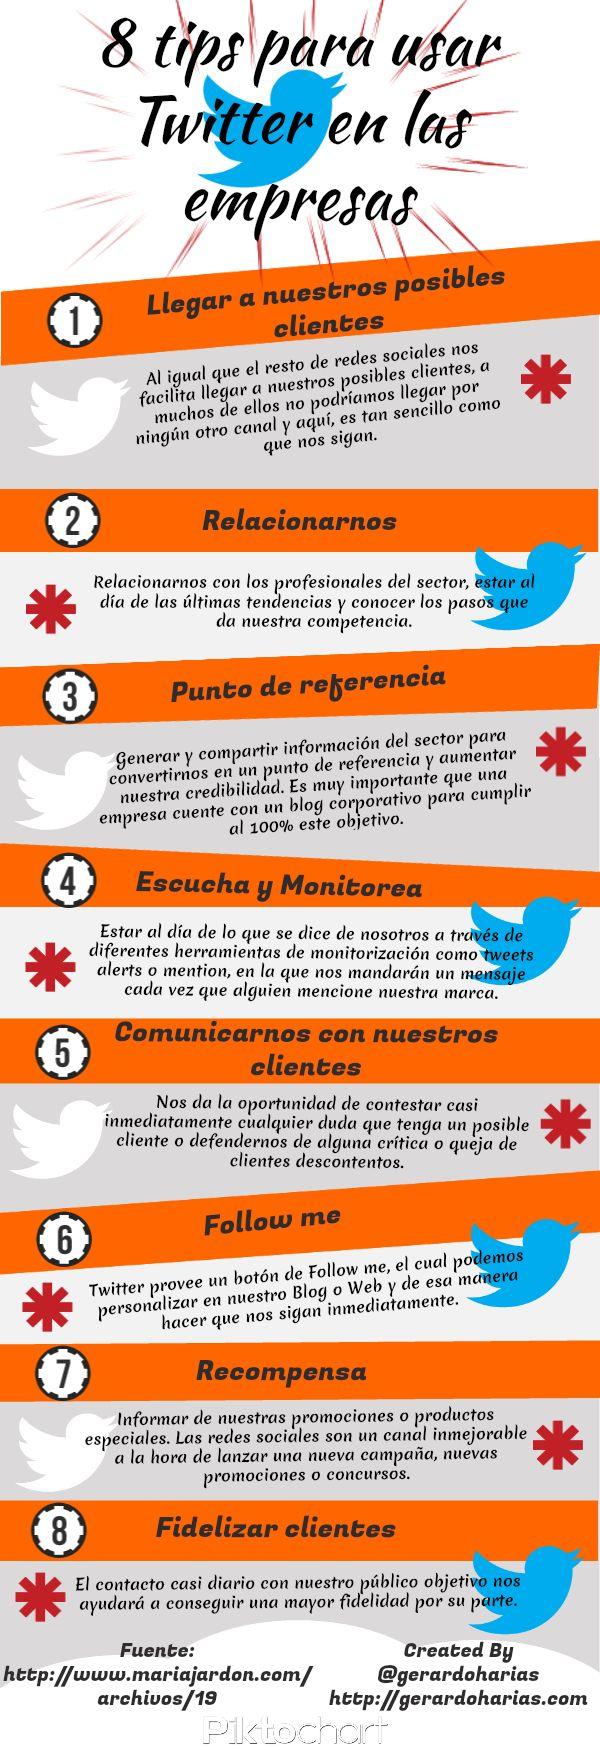 8 Tips para Usar #Twitter en las Empresas